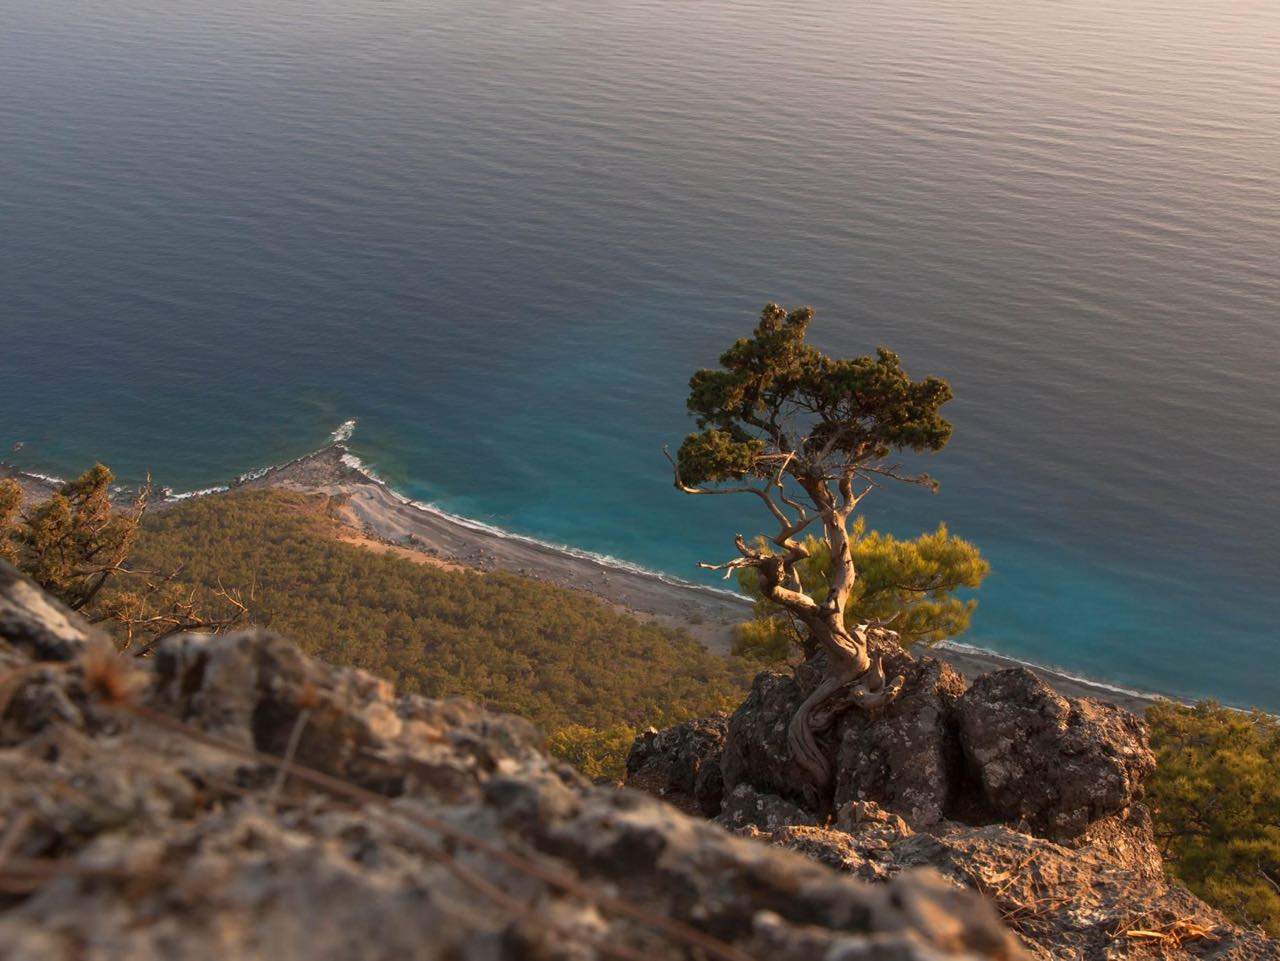 Car Rental Offer To Enjoy Lovely Crete